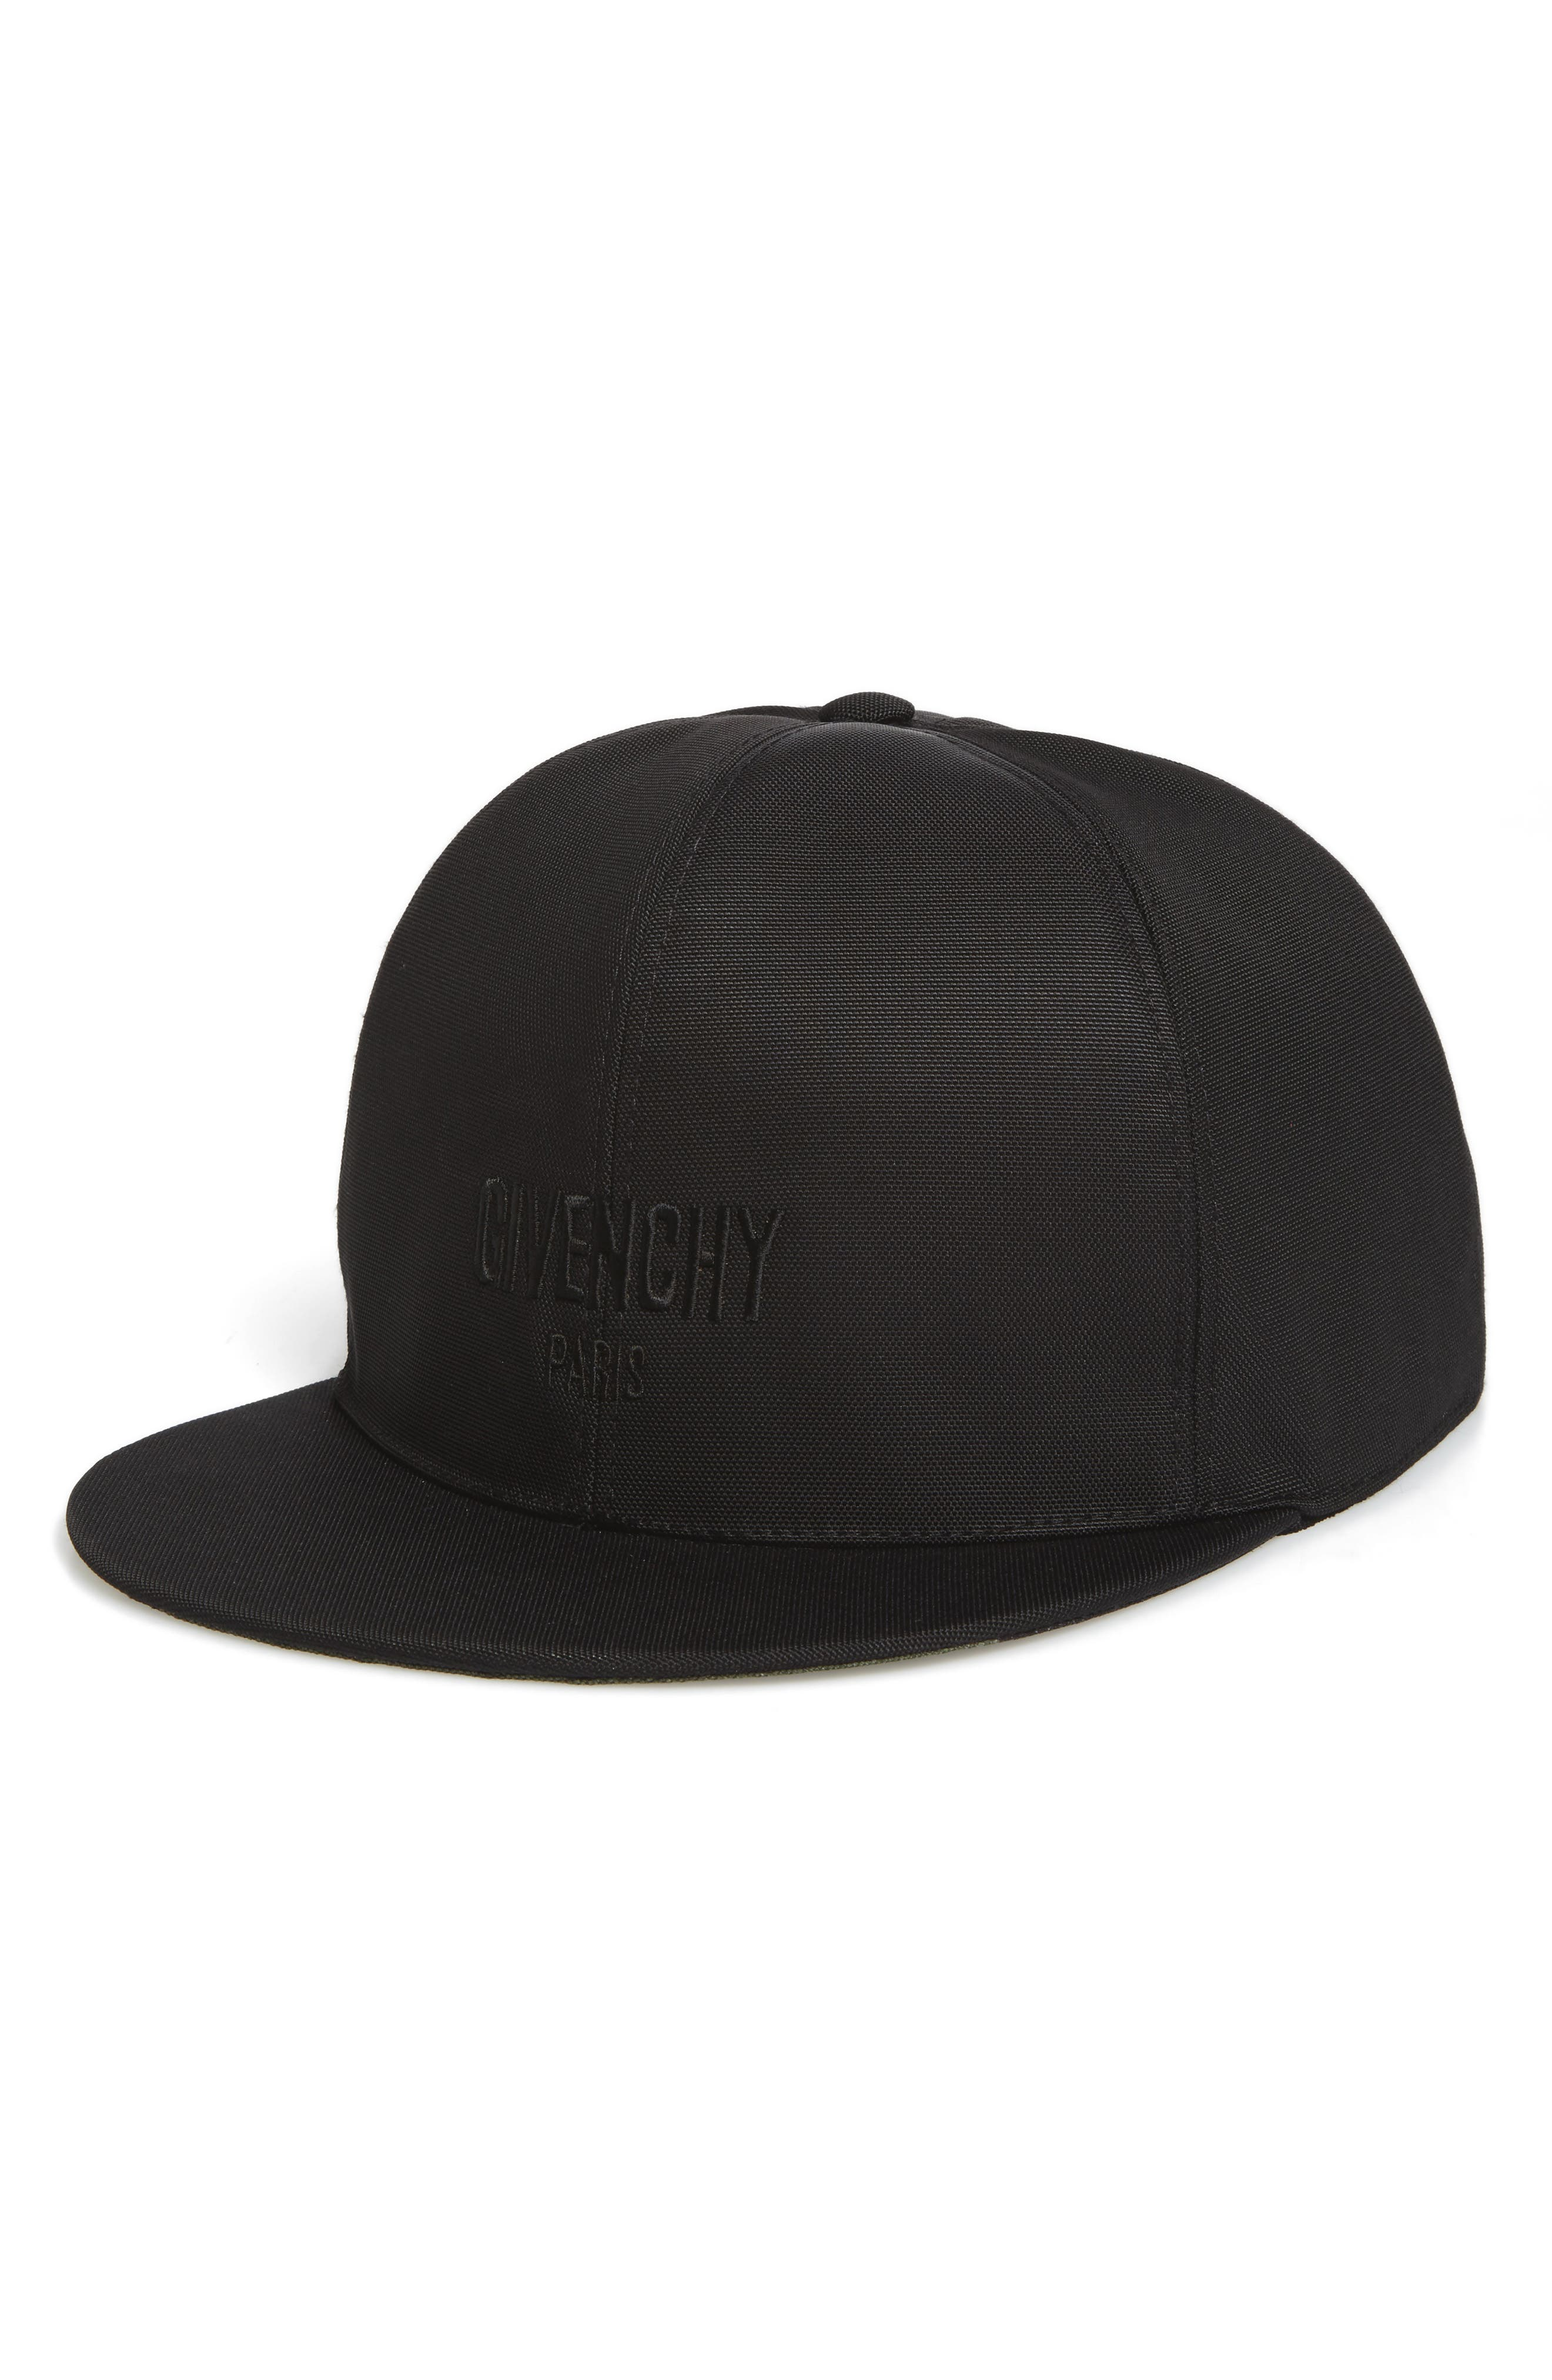 Embroidered Baseball Cap,                             Main thumbnail 1, color,                             Black Multi